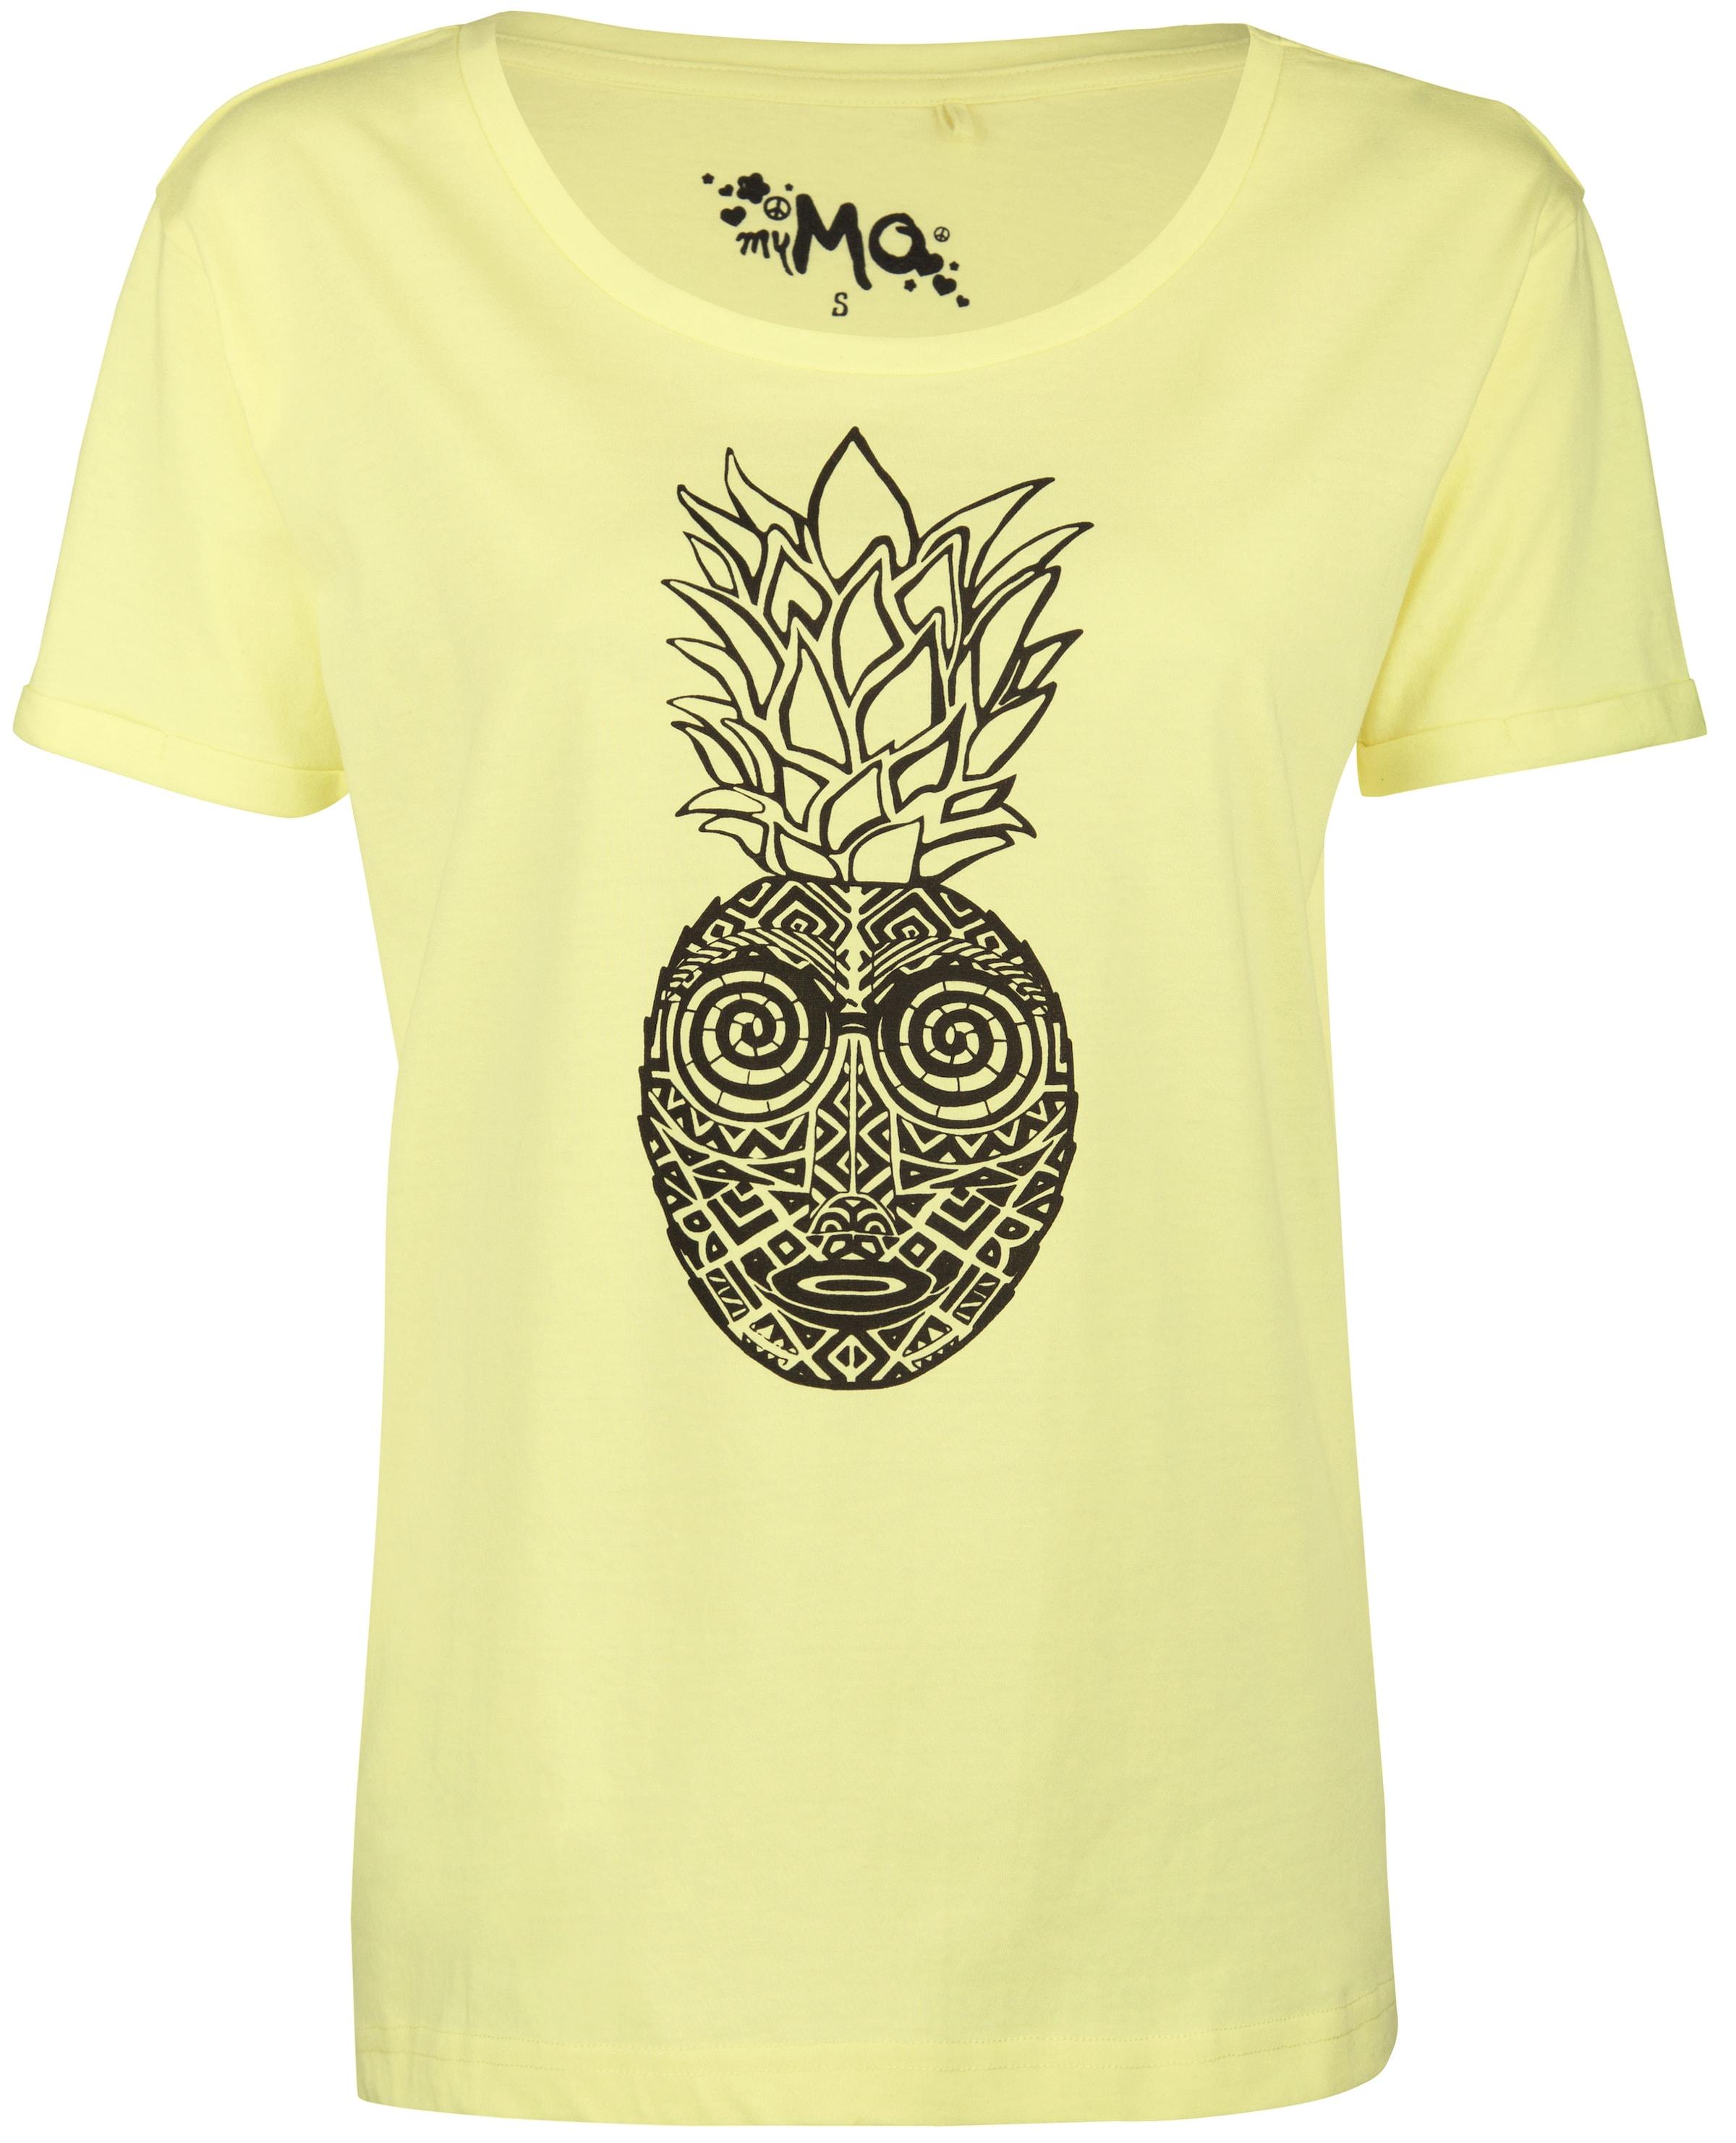 shirt Mymo T shirt Jaune En shirt Mymo T Jaune En Mymo En T 9WDHIebE2Y